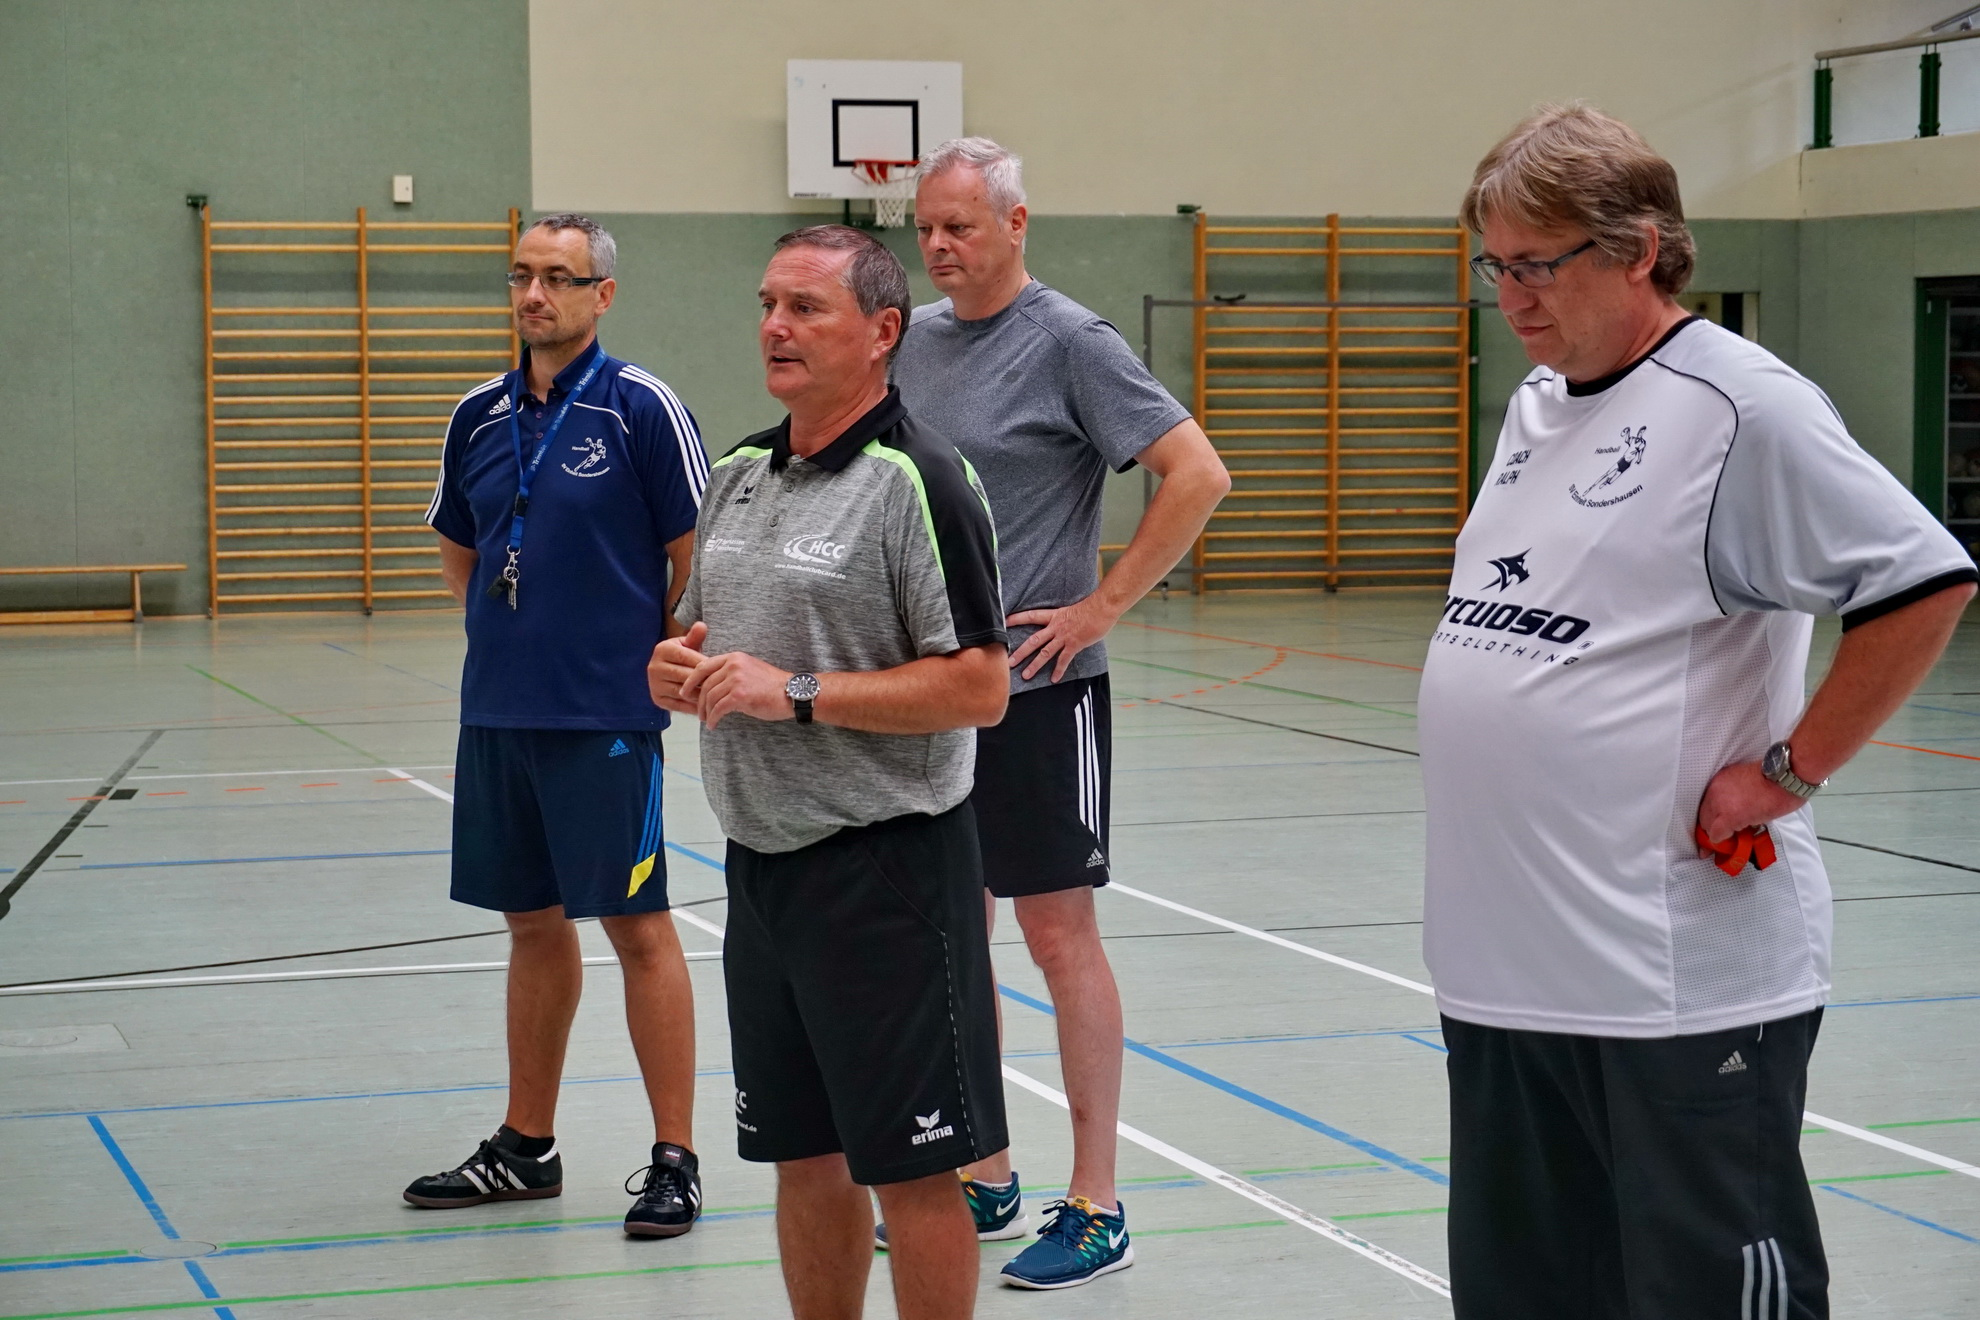 201808_Handballcamp_SDH_MG_010w